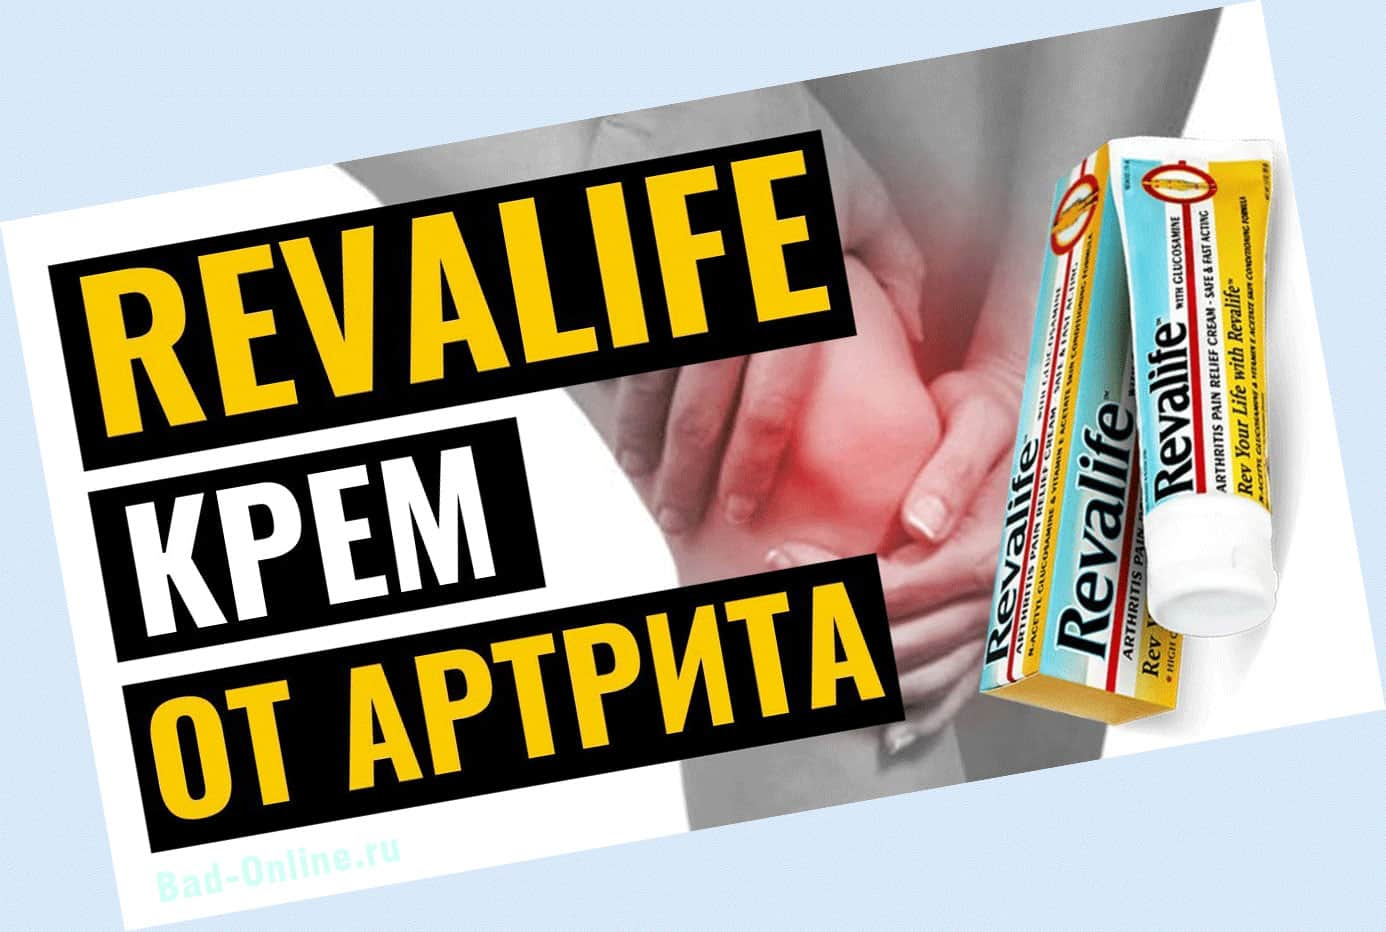 Revalife от артрита – это правда или развод?